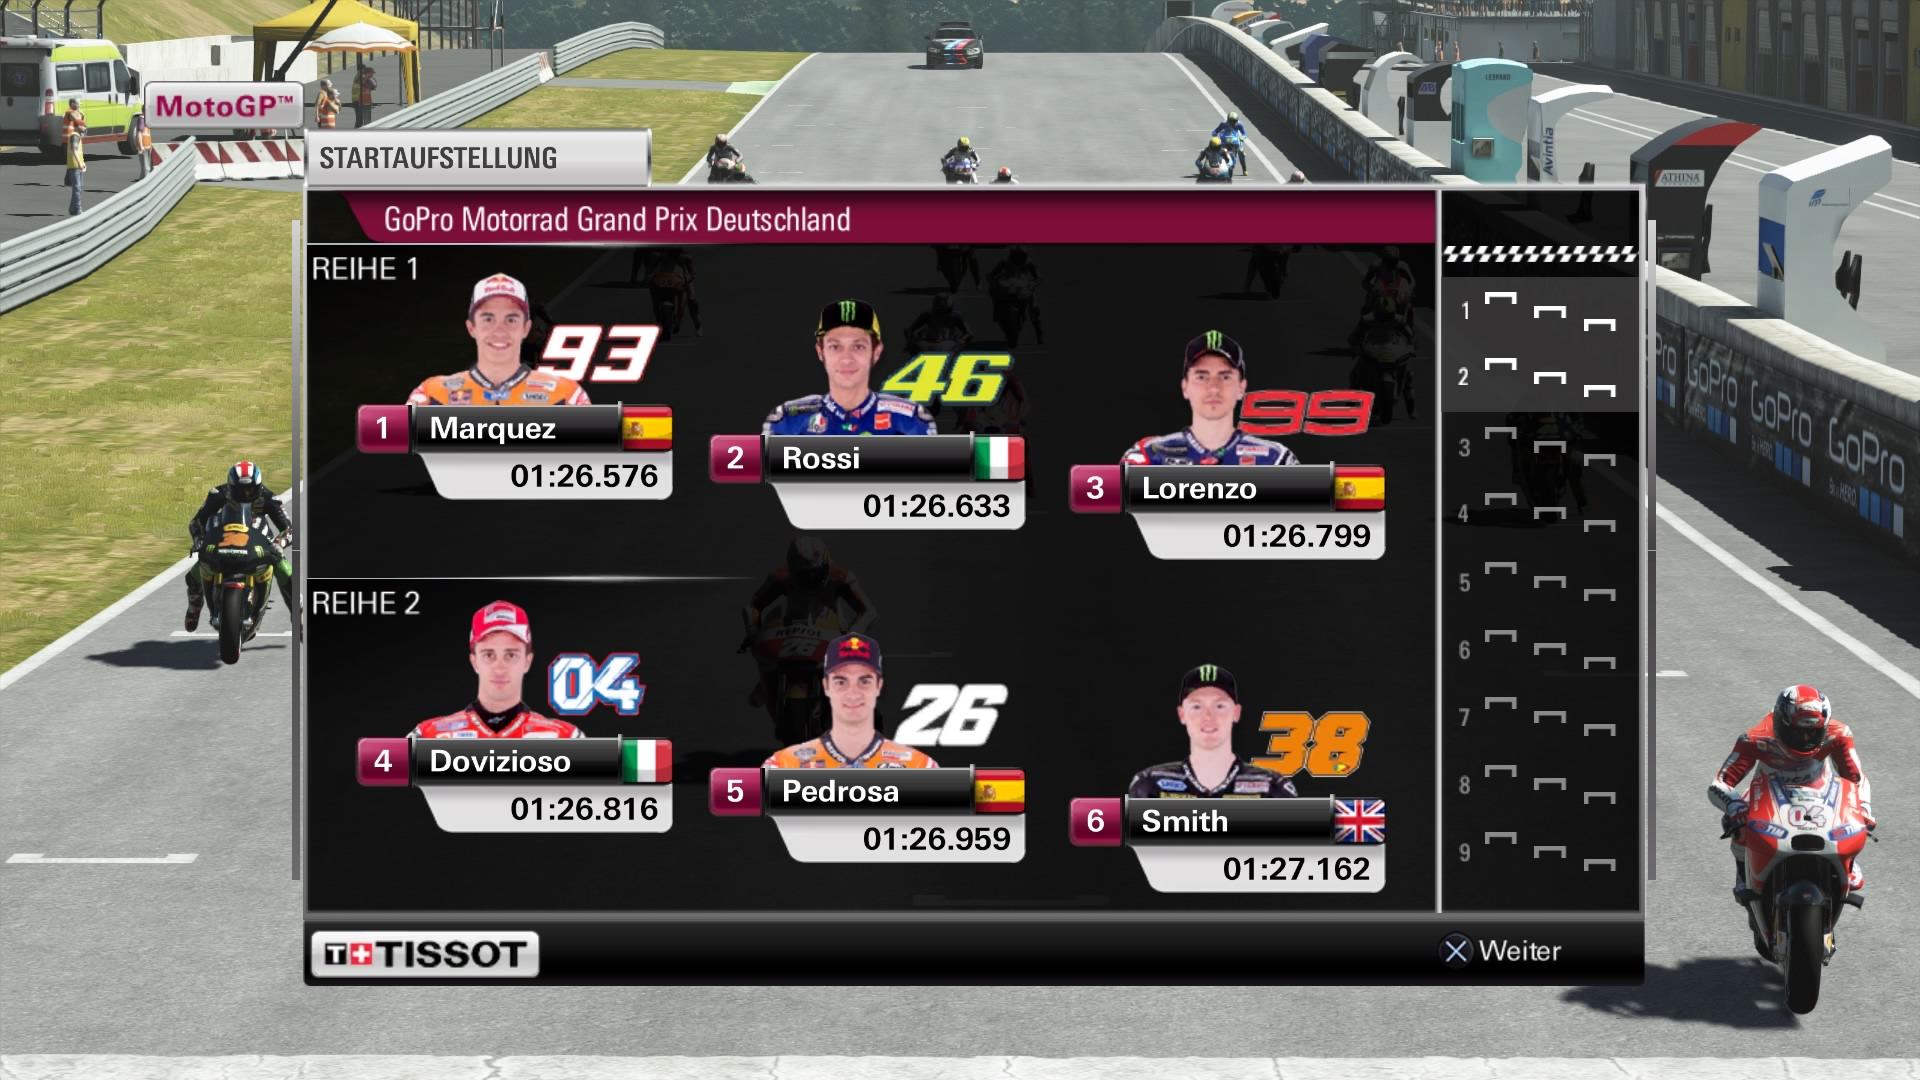 MotoGP 15 (Eigene Screenshots/PS4) - Screenshot-Galerie | GamersGlobal.de